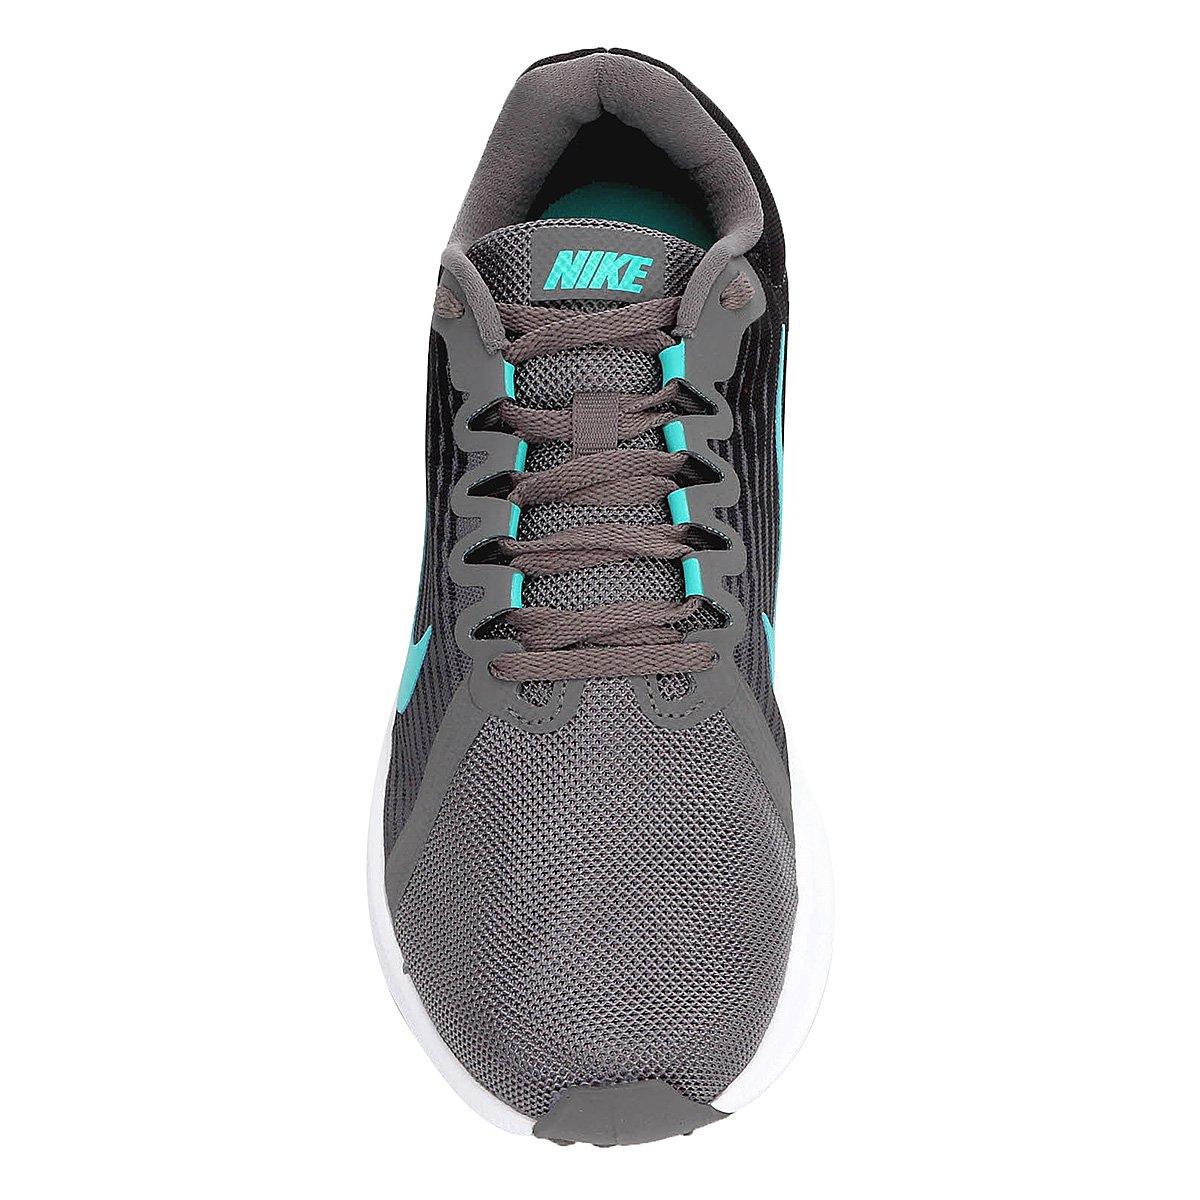 Tênis Nike Wmns Downshifter 8 Feminino Preto E Cinza